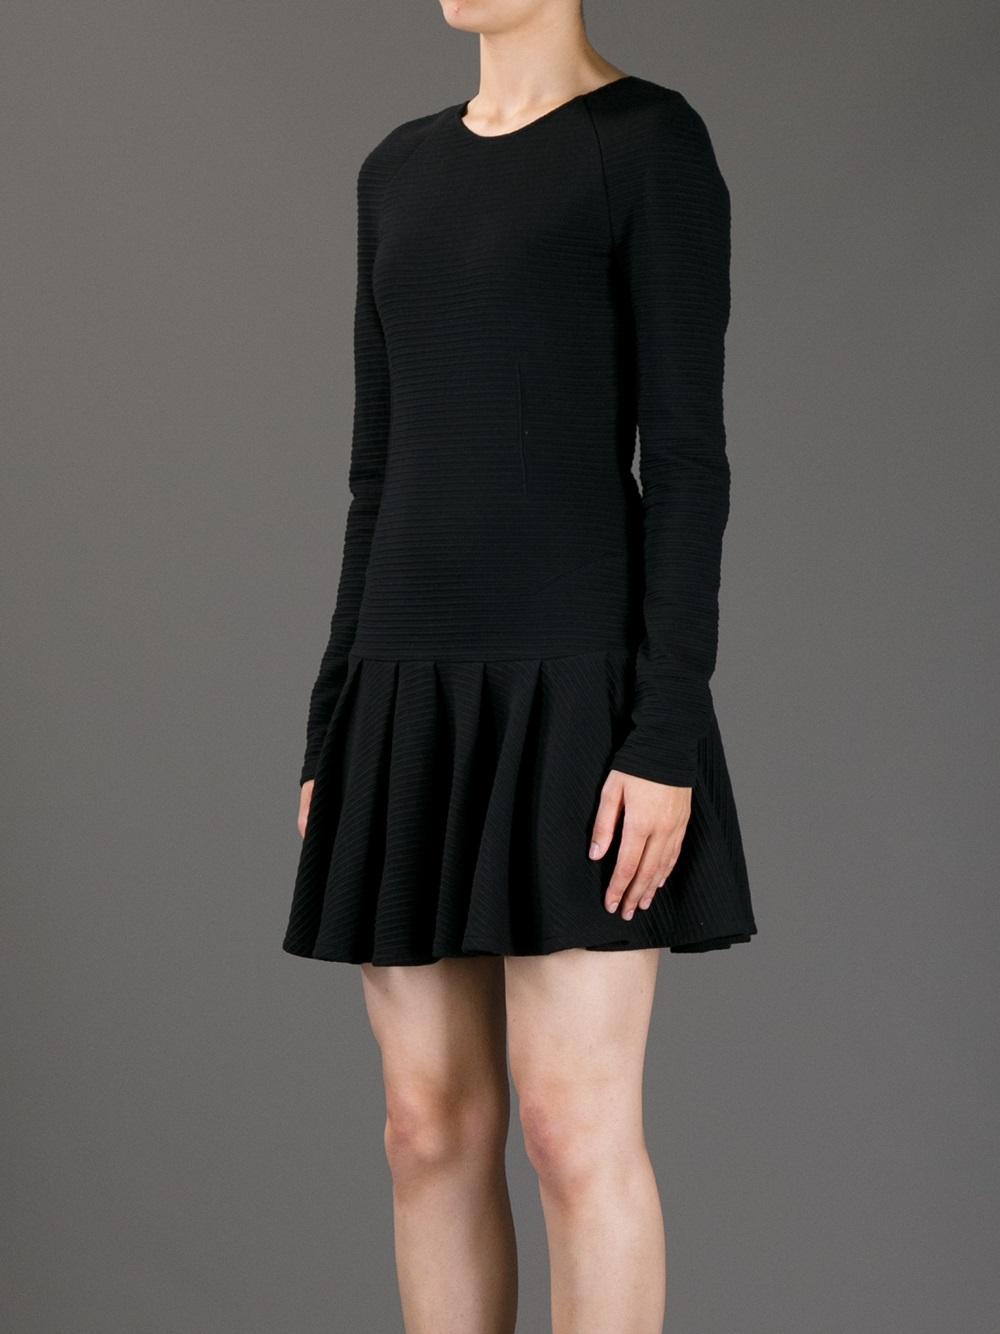 Lyst Kenzo Pleated Skater Dress In Black